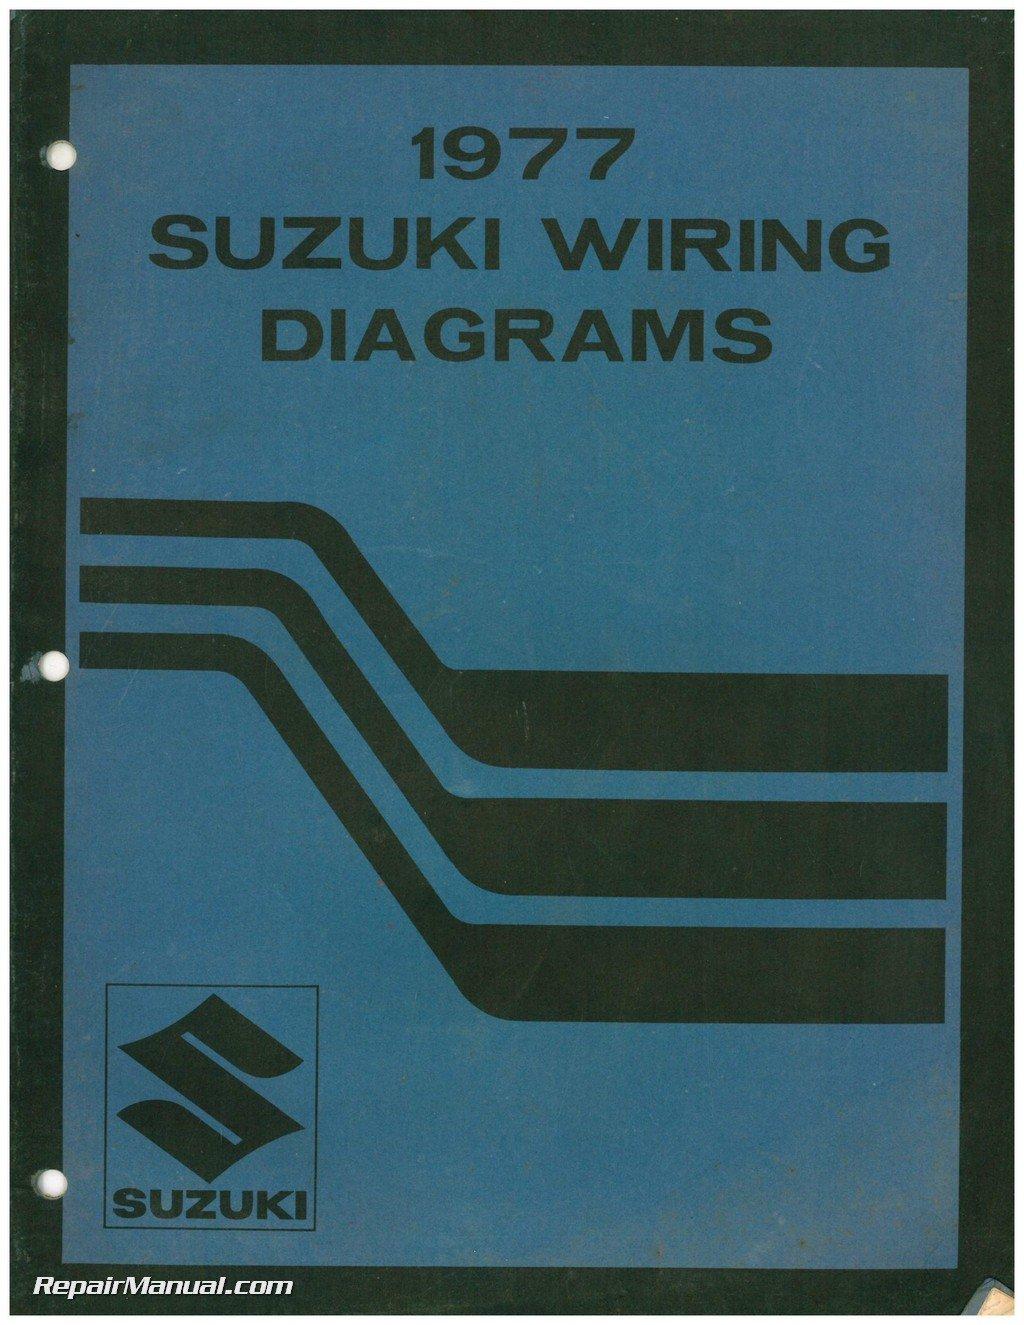 SUZ-1977-WIRING 1977 Suzuki Wiring Diagram Manual - Troubleshooting Info:  Manufacturer: Amazon.com: Books